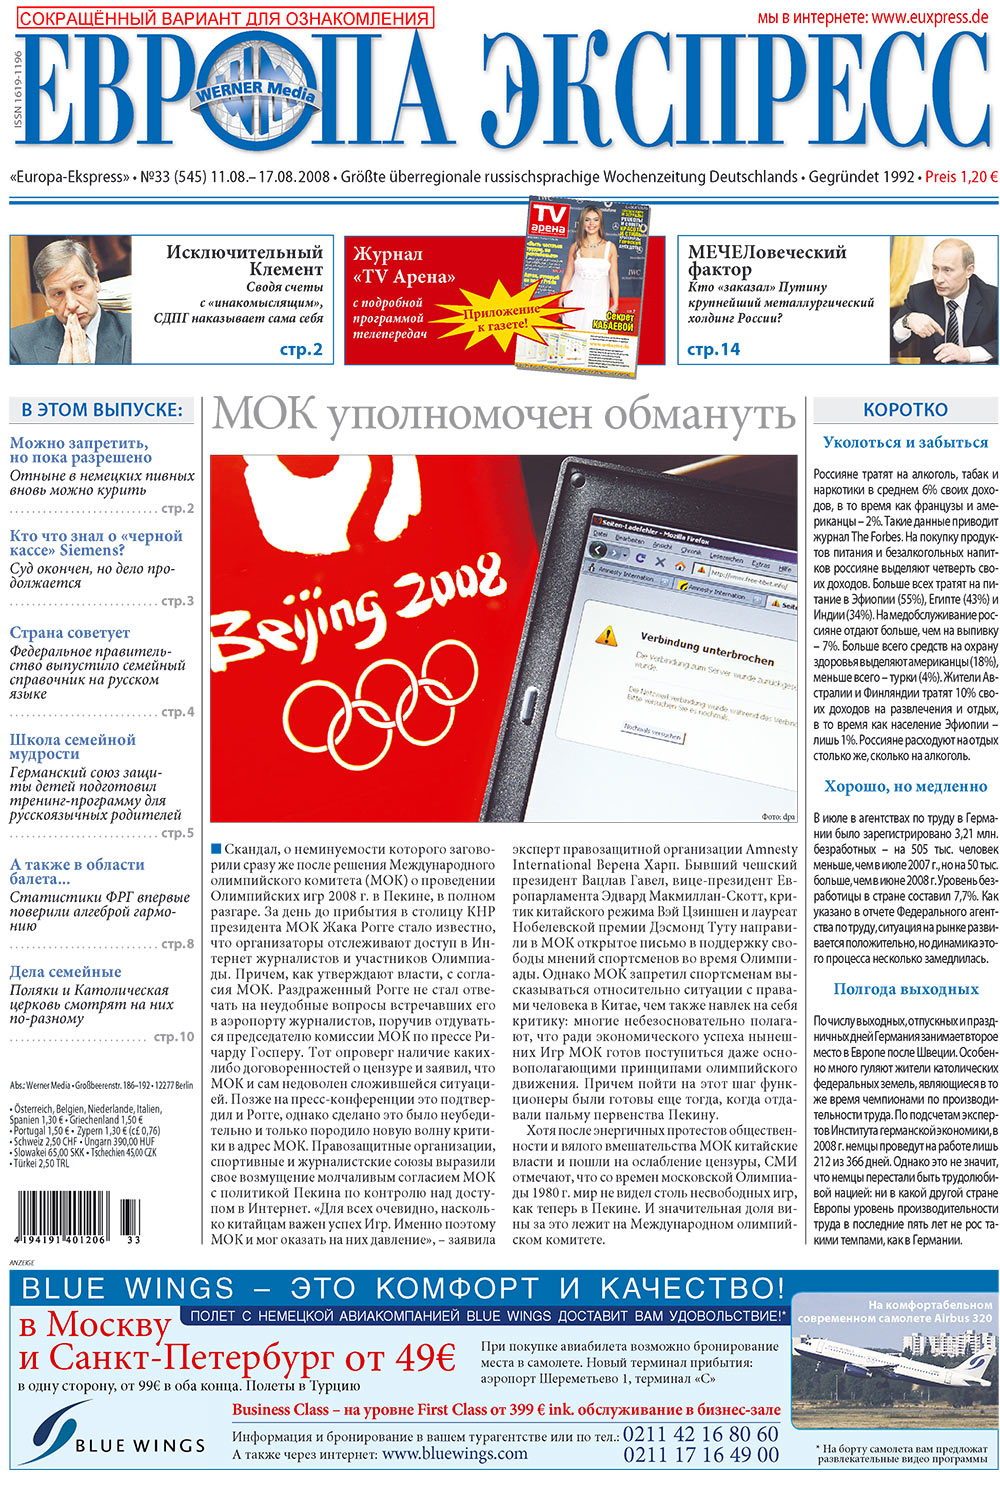 Европа экспресс (газета). 2008 год, номер 33, стр. 1